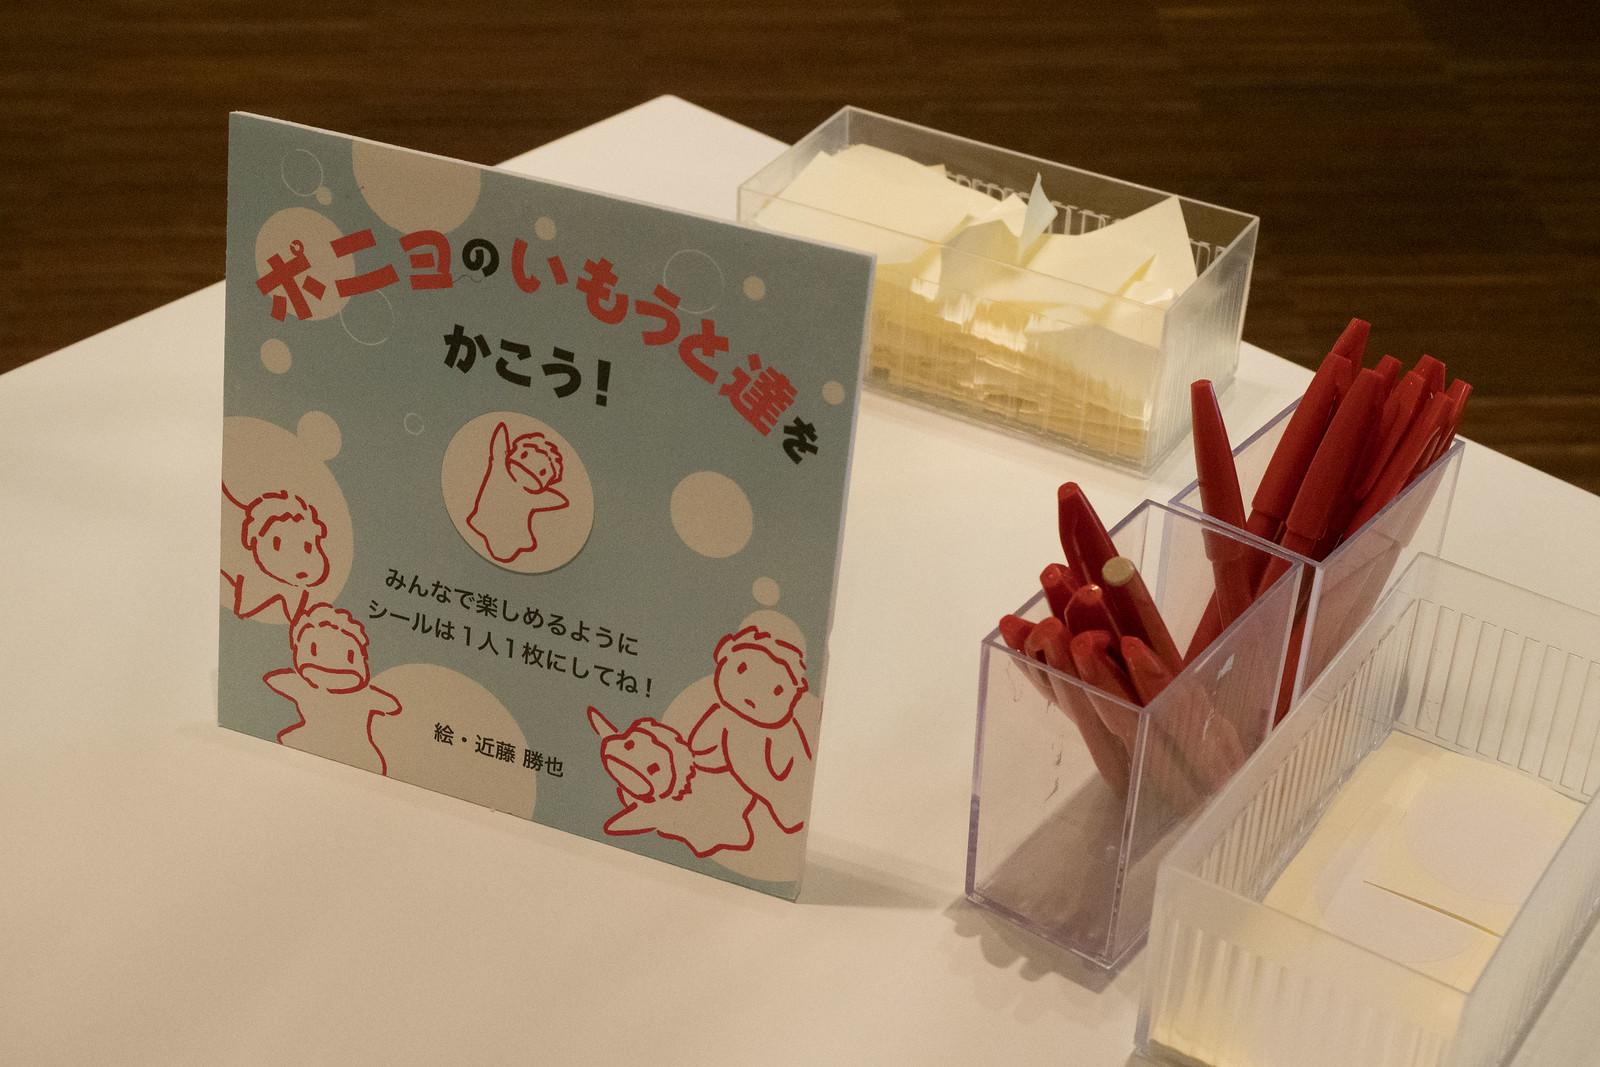 Ghibli_katsuyakondo-30